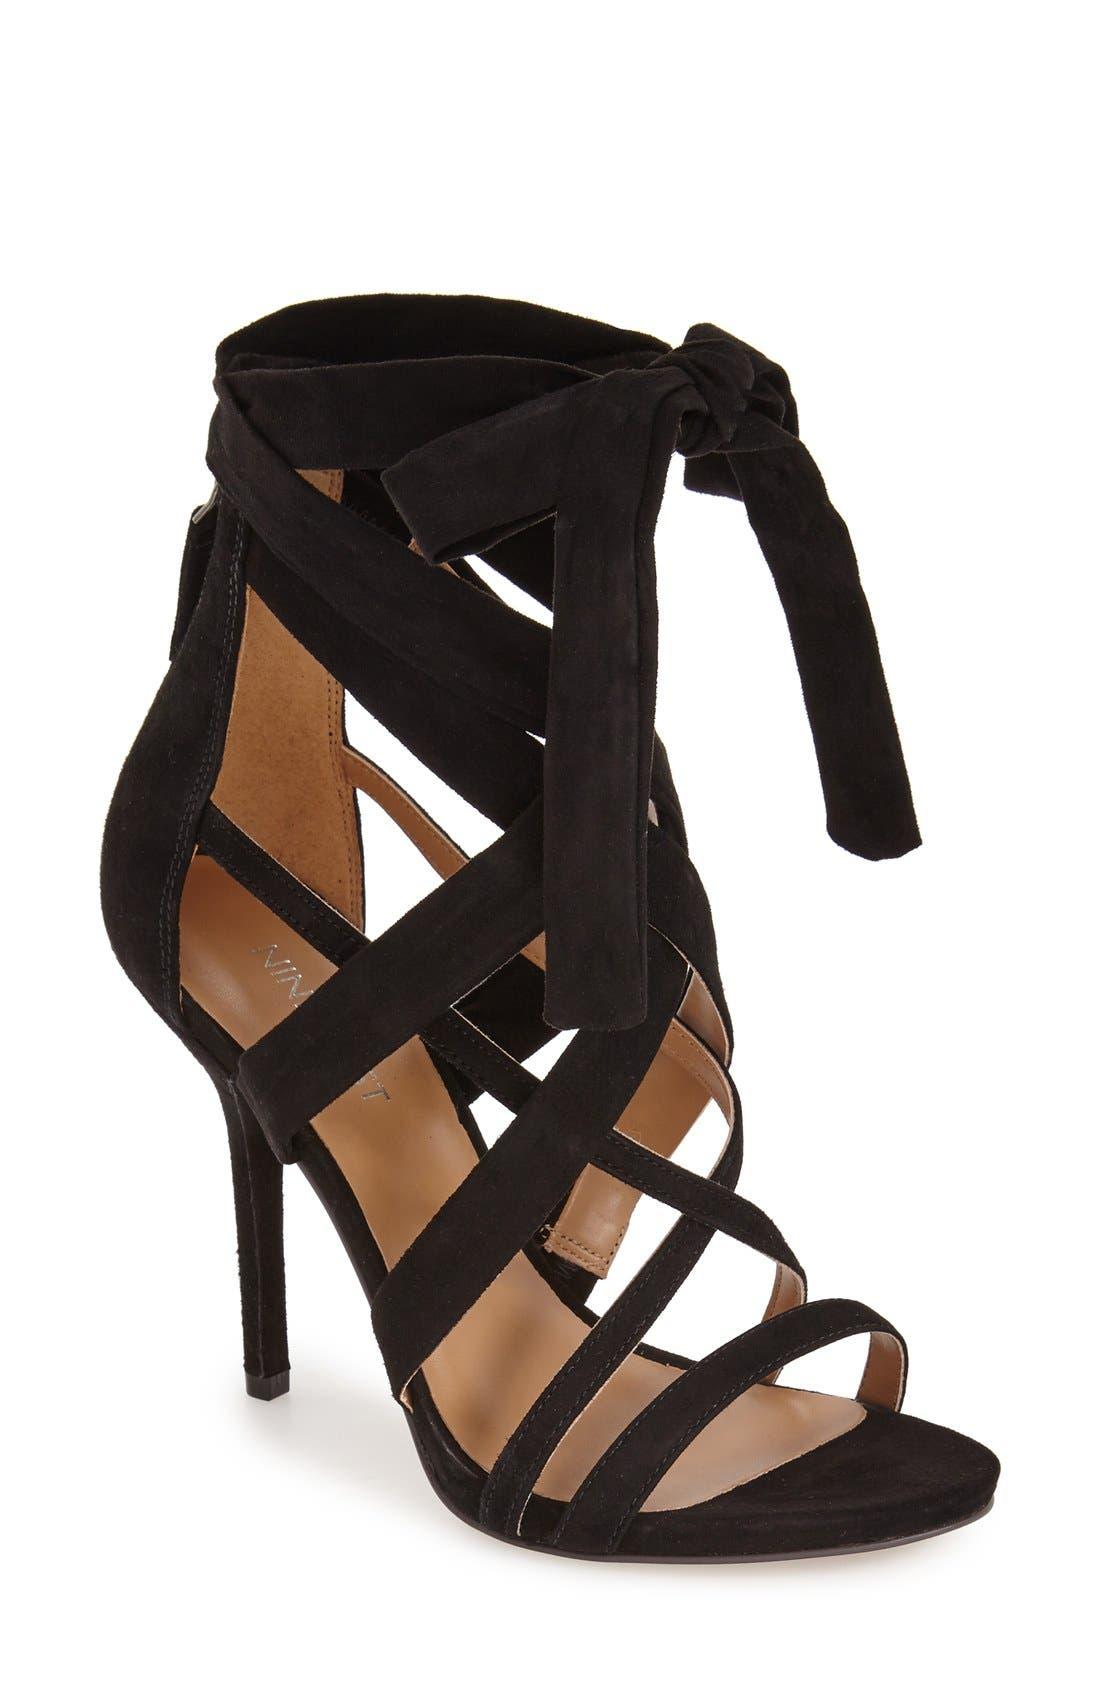 Alternate Image 1 Selected - Nine West 'Rustic' Sandal (Women)